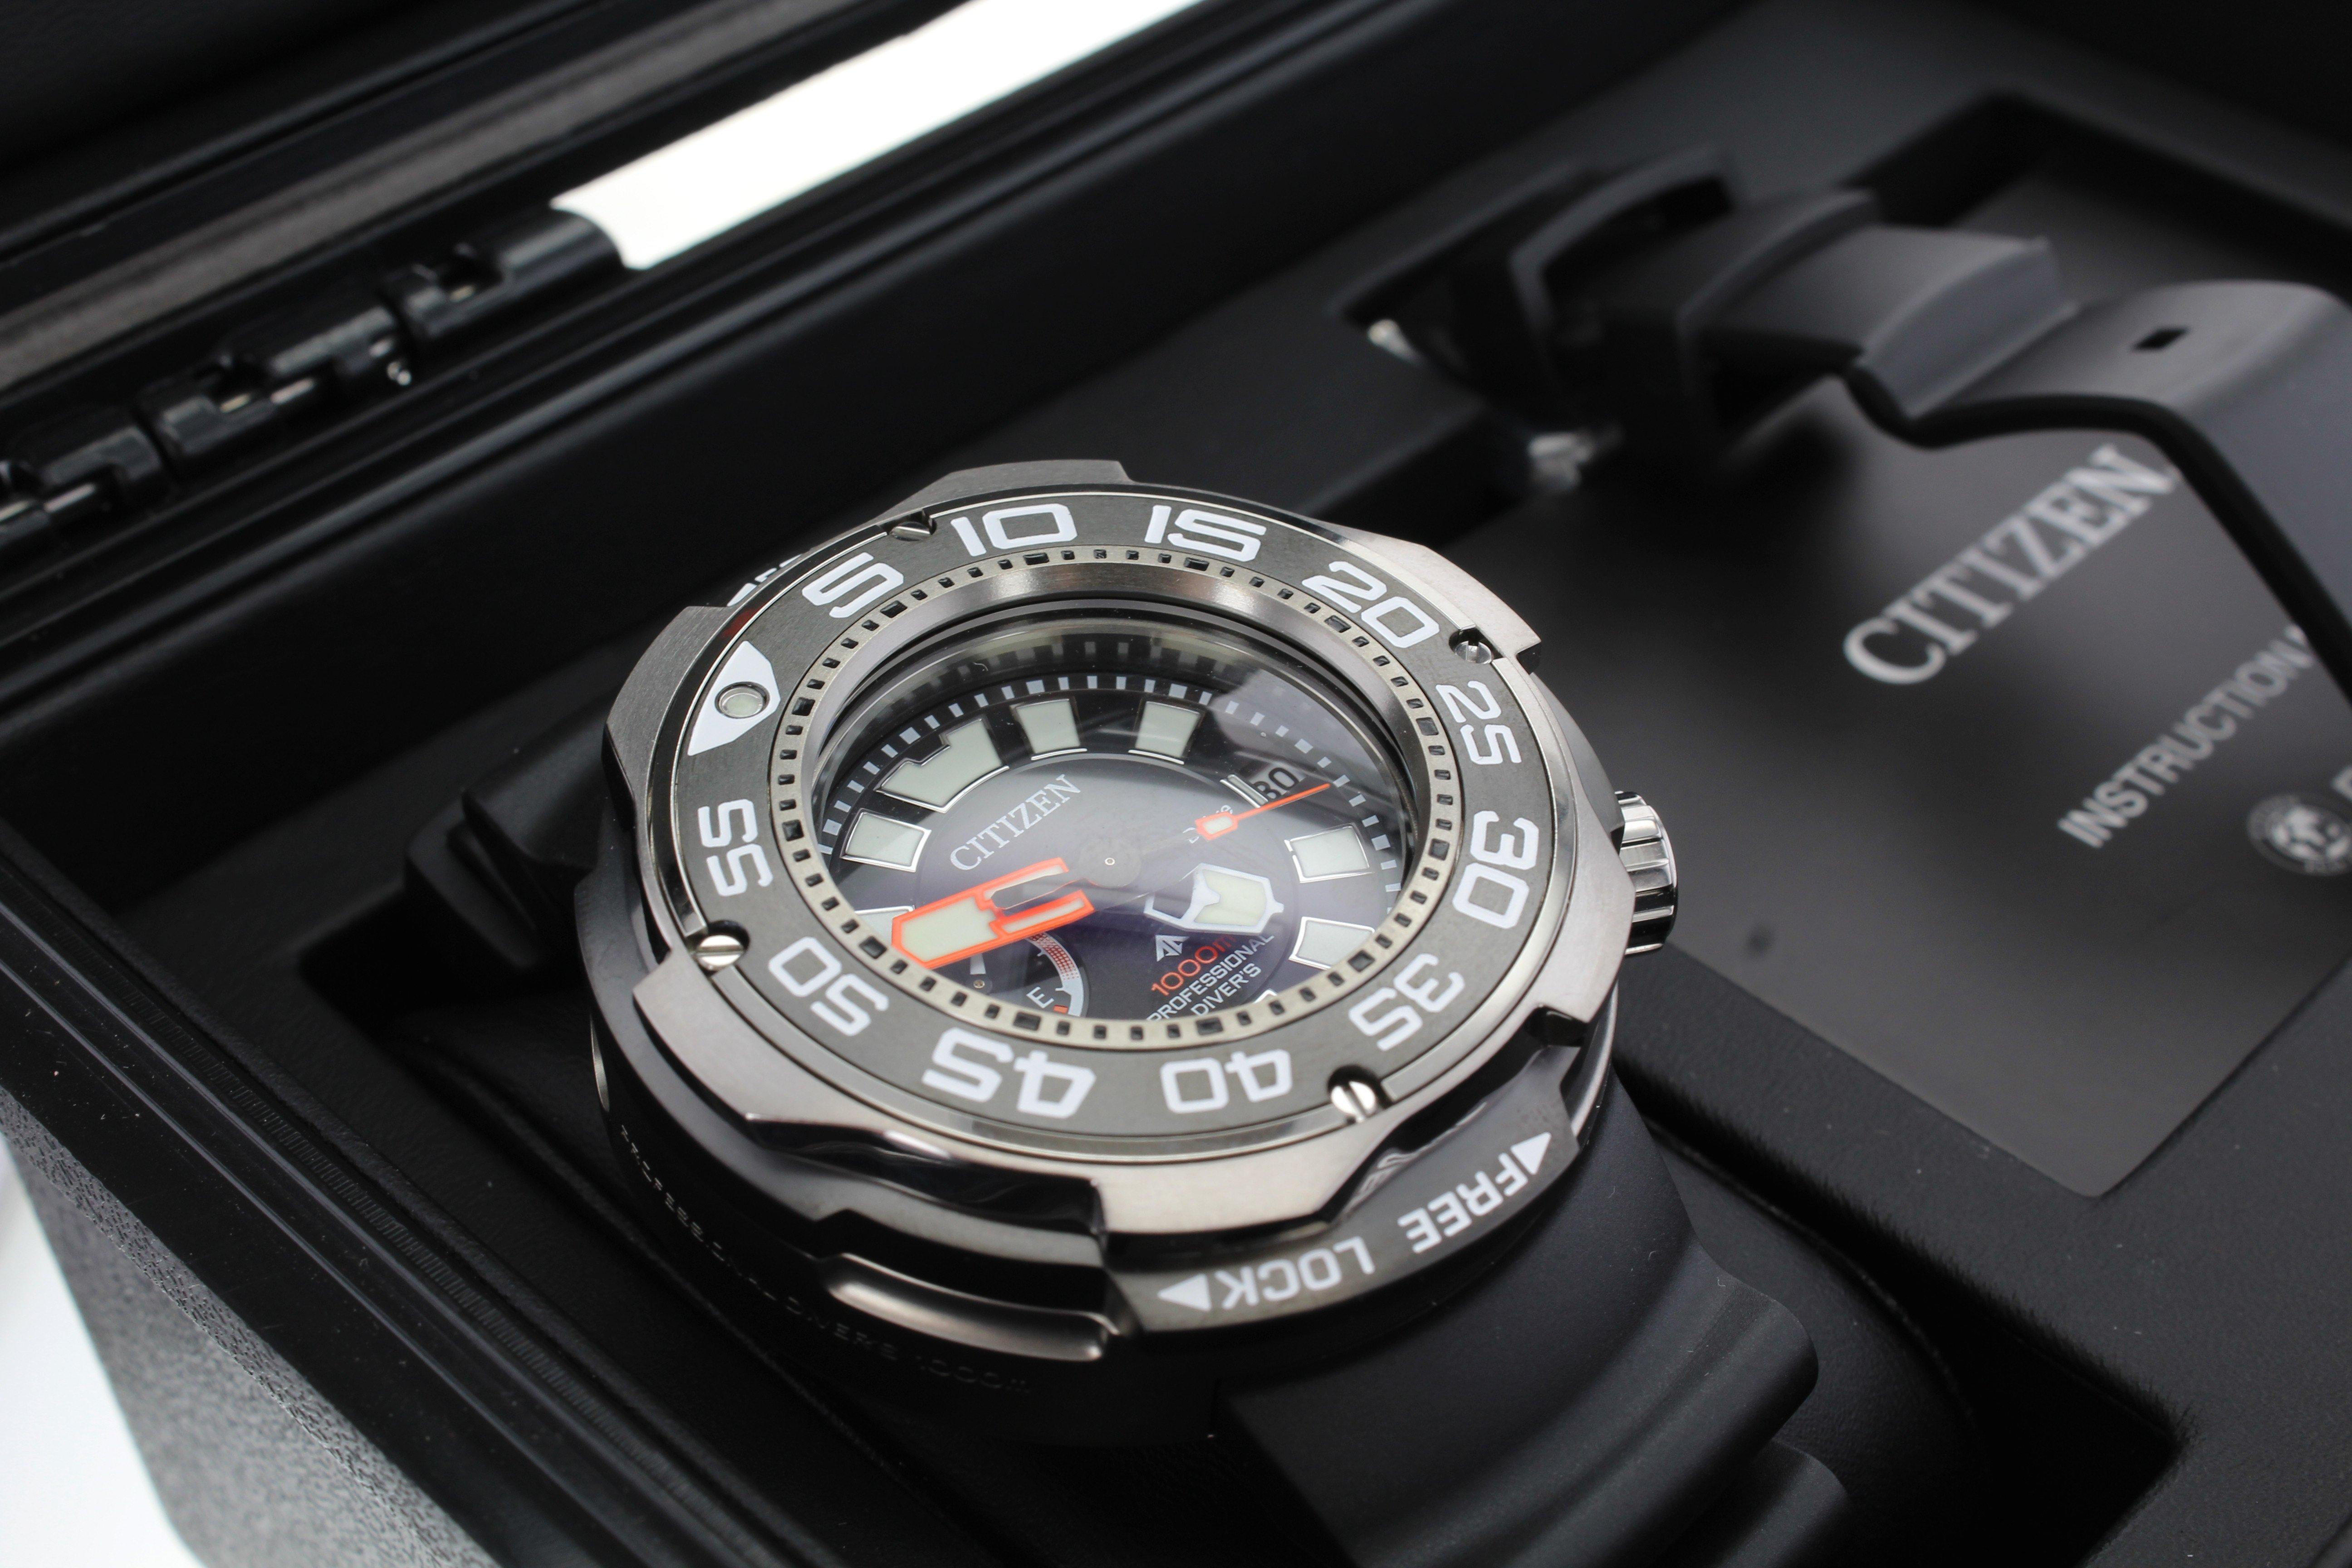 Citizen Promaster Divers 1000m watch - First Class Watches Blog fa35a516a6